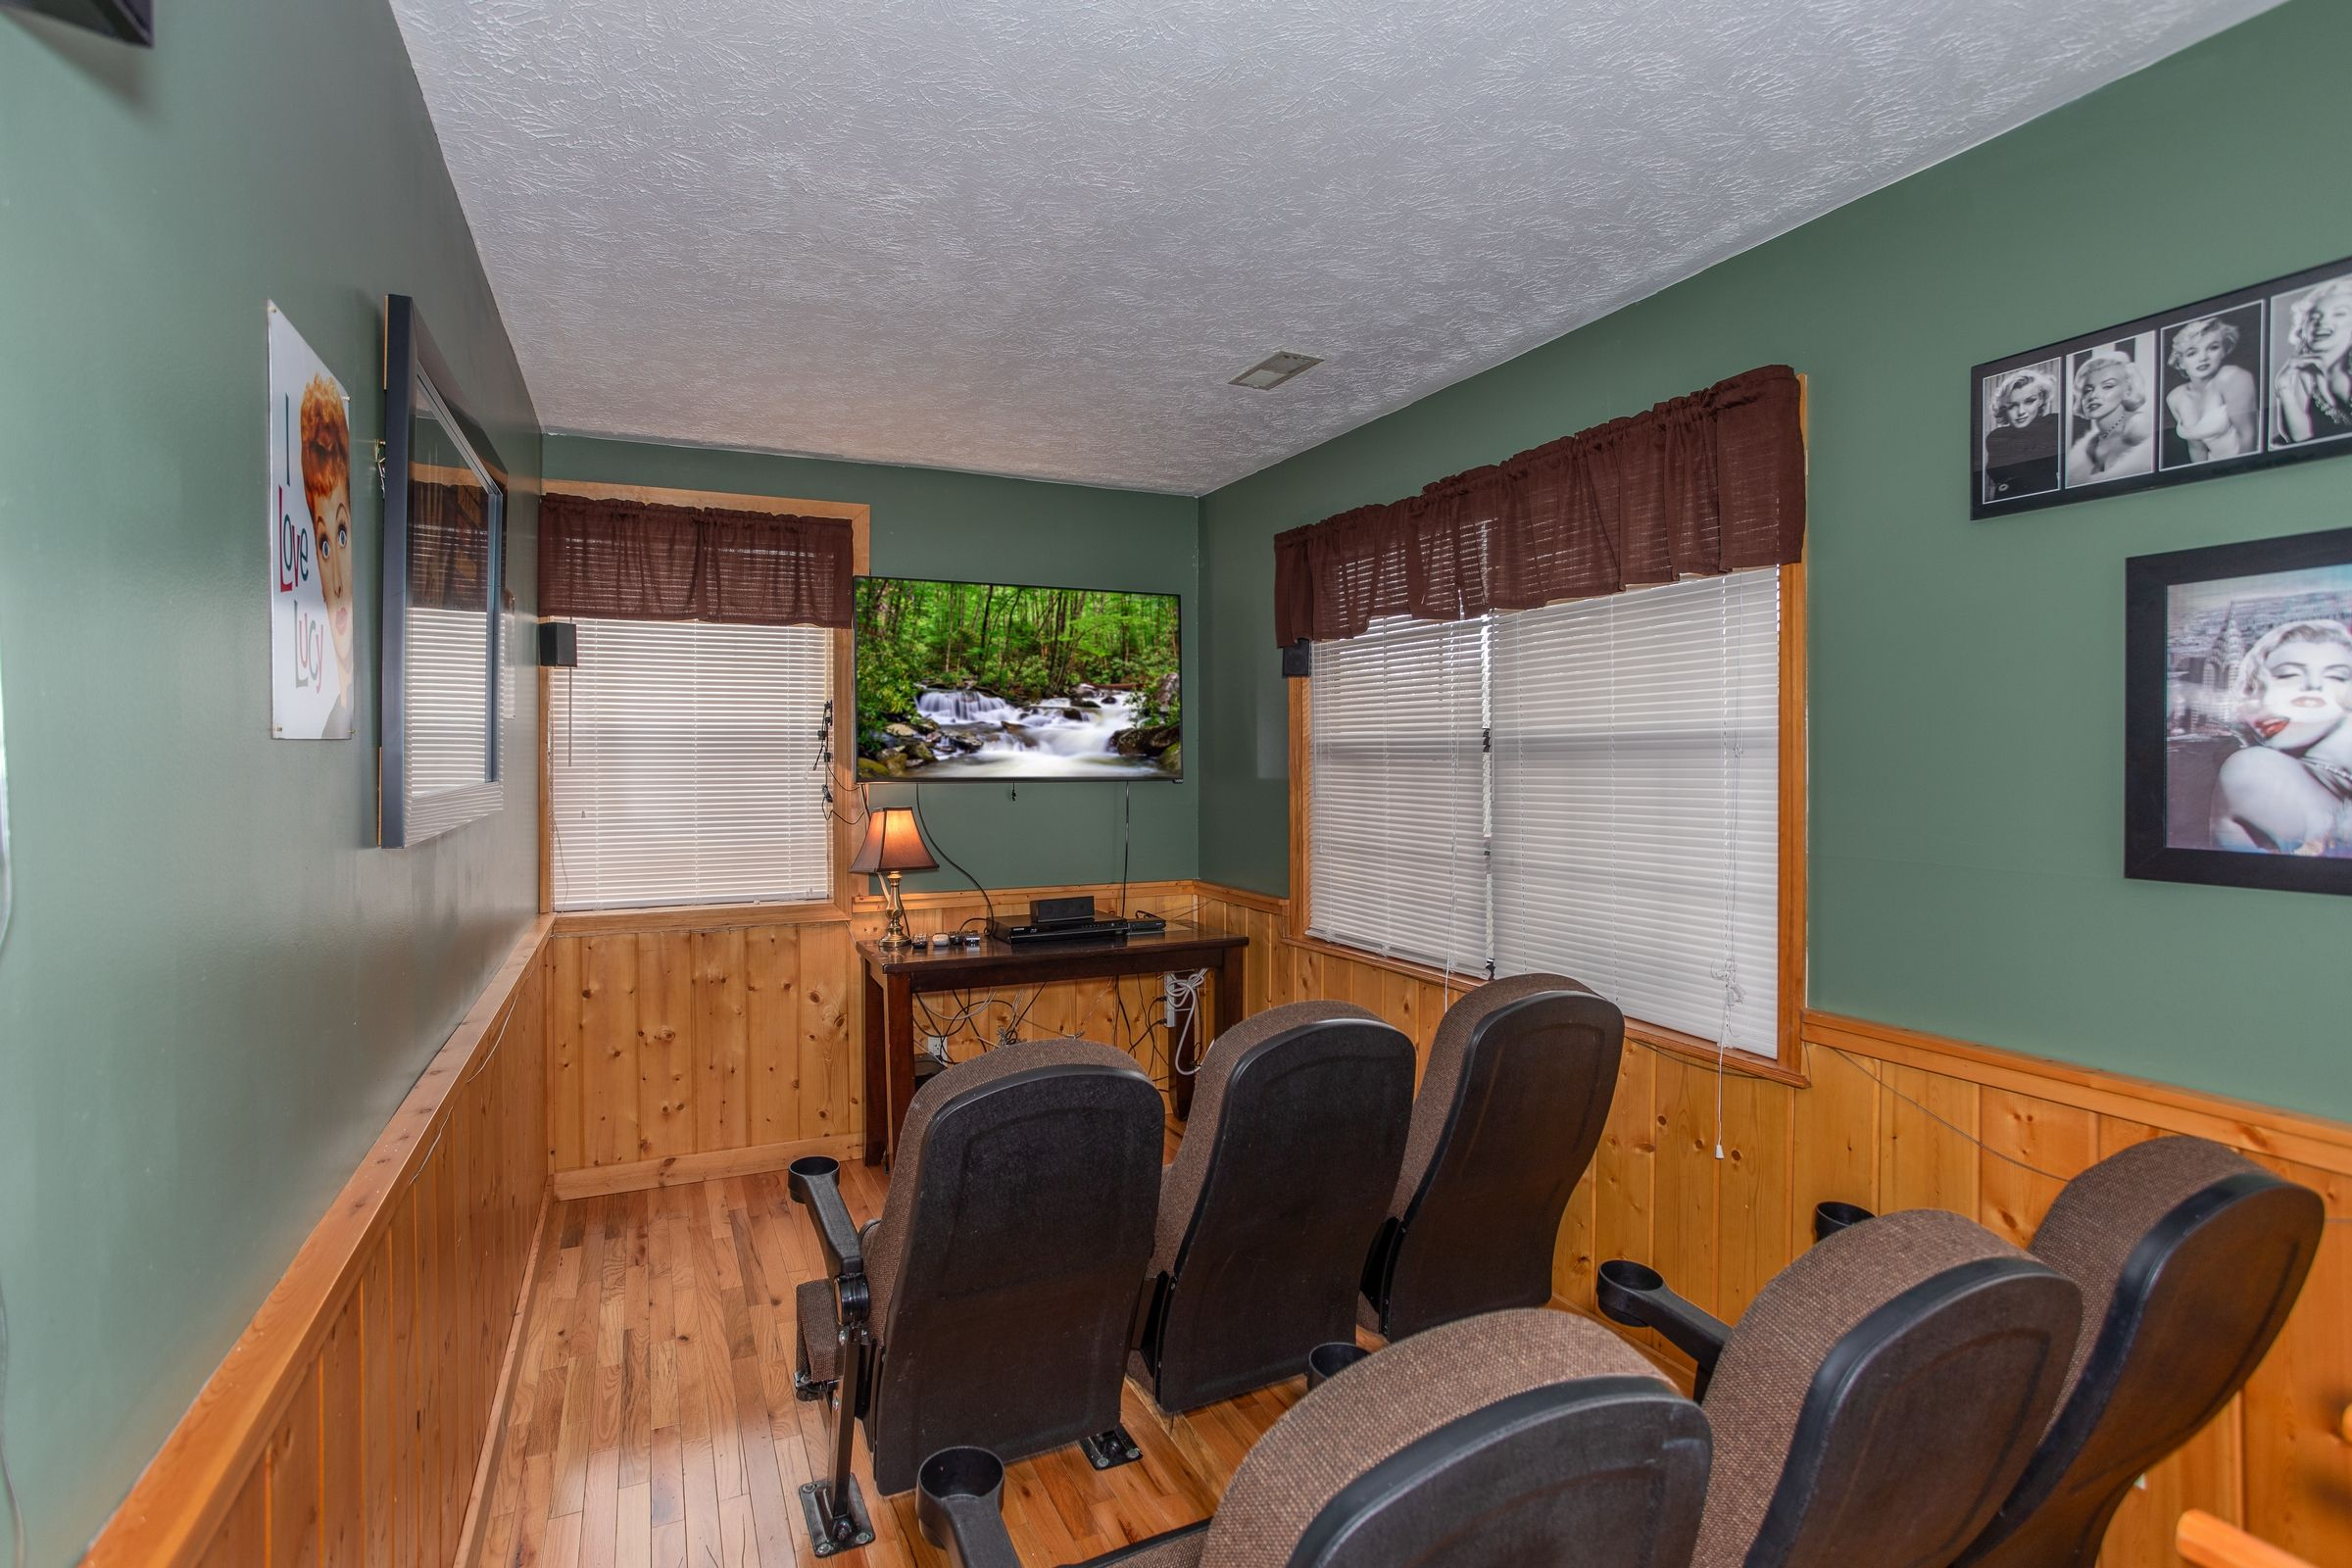 Burrow Inn - Deluxe 4 Bedroom Pigeon Forge Cabin Rental in